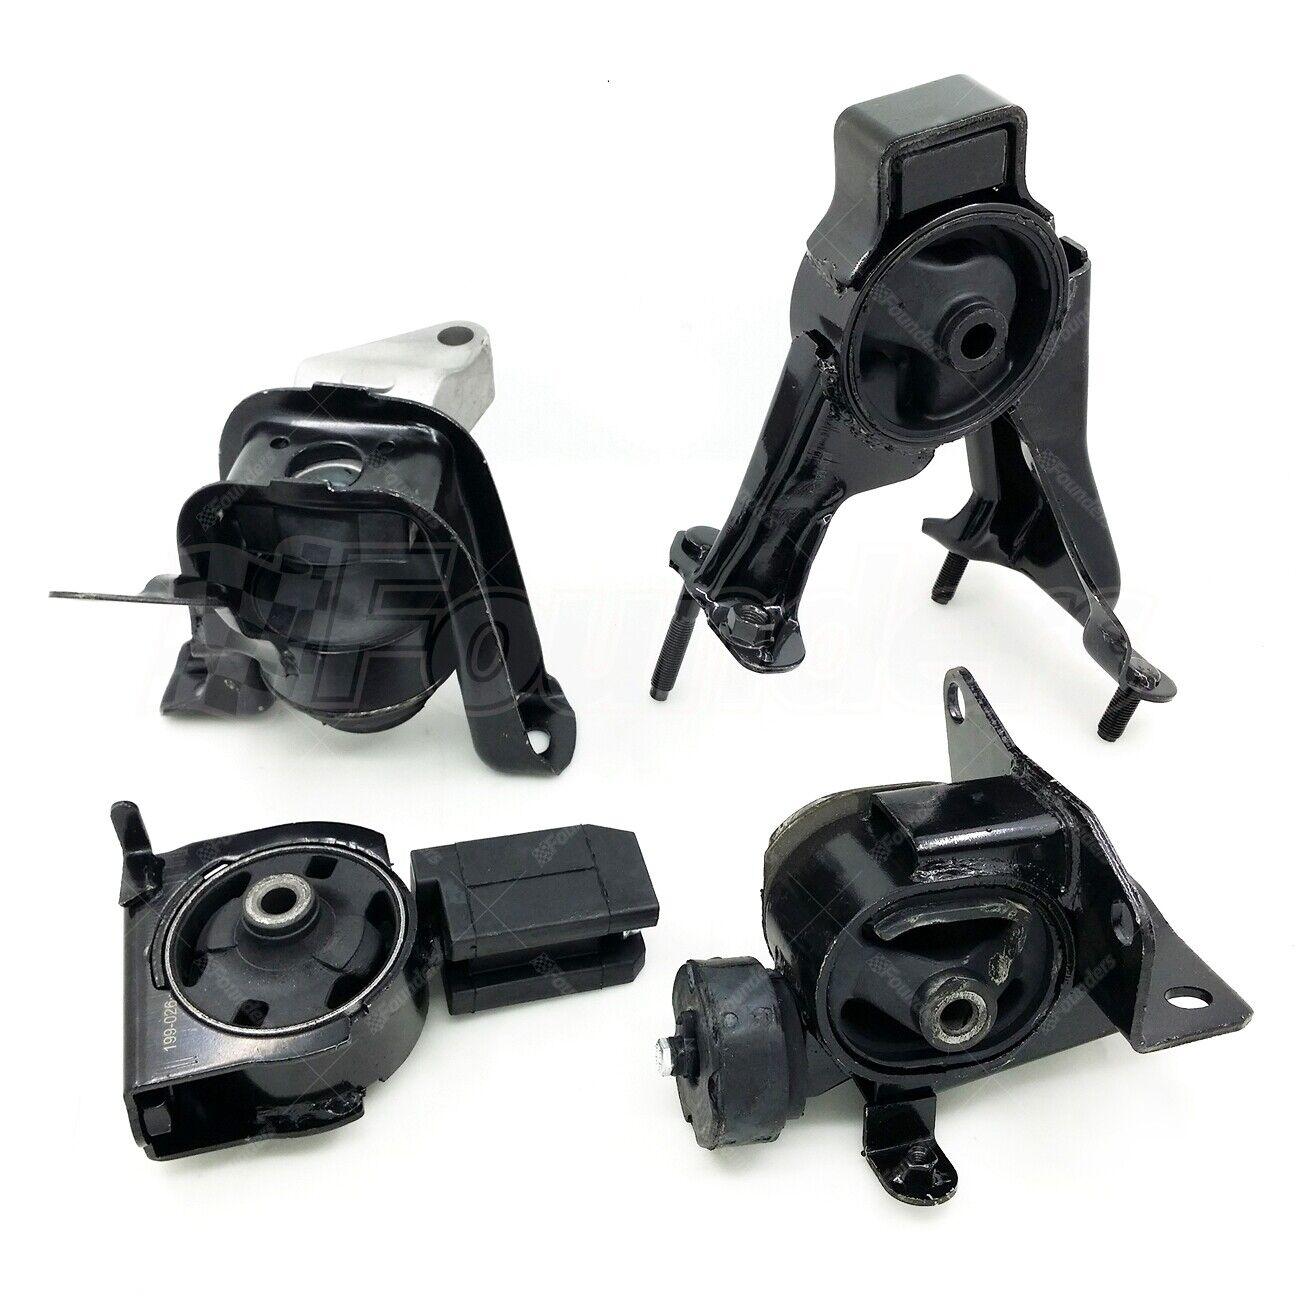 Set of 4 pcs Transmission /& Motor Mount for 03-08 Toyota Corolla 1.8L Automatic